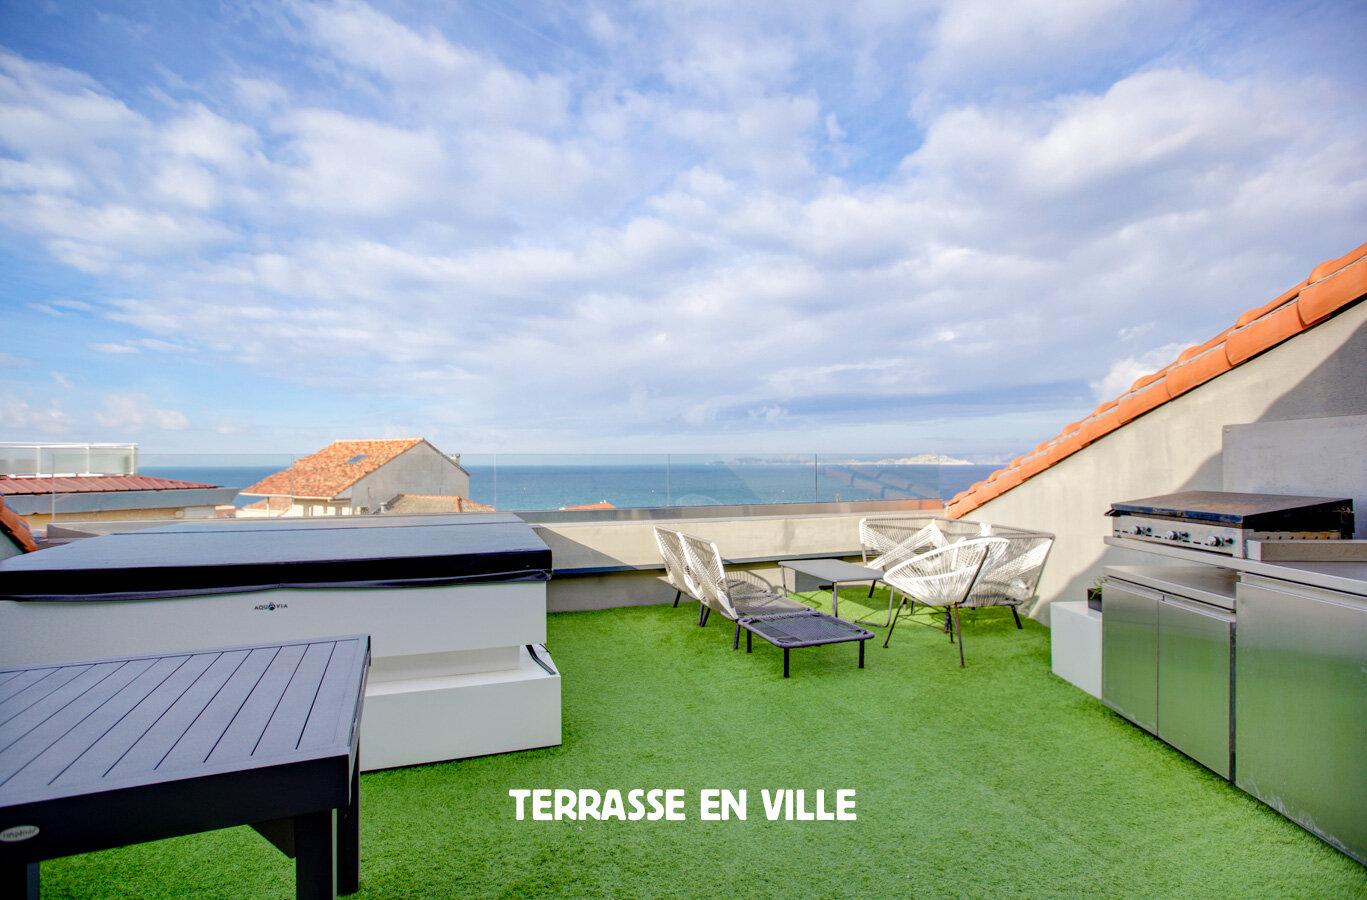 terrasse-7.jpg